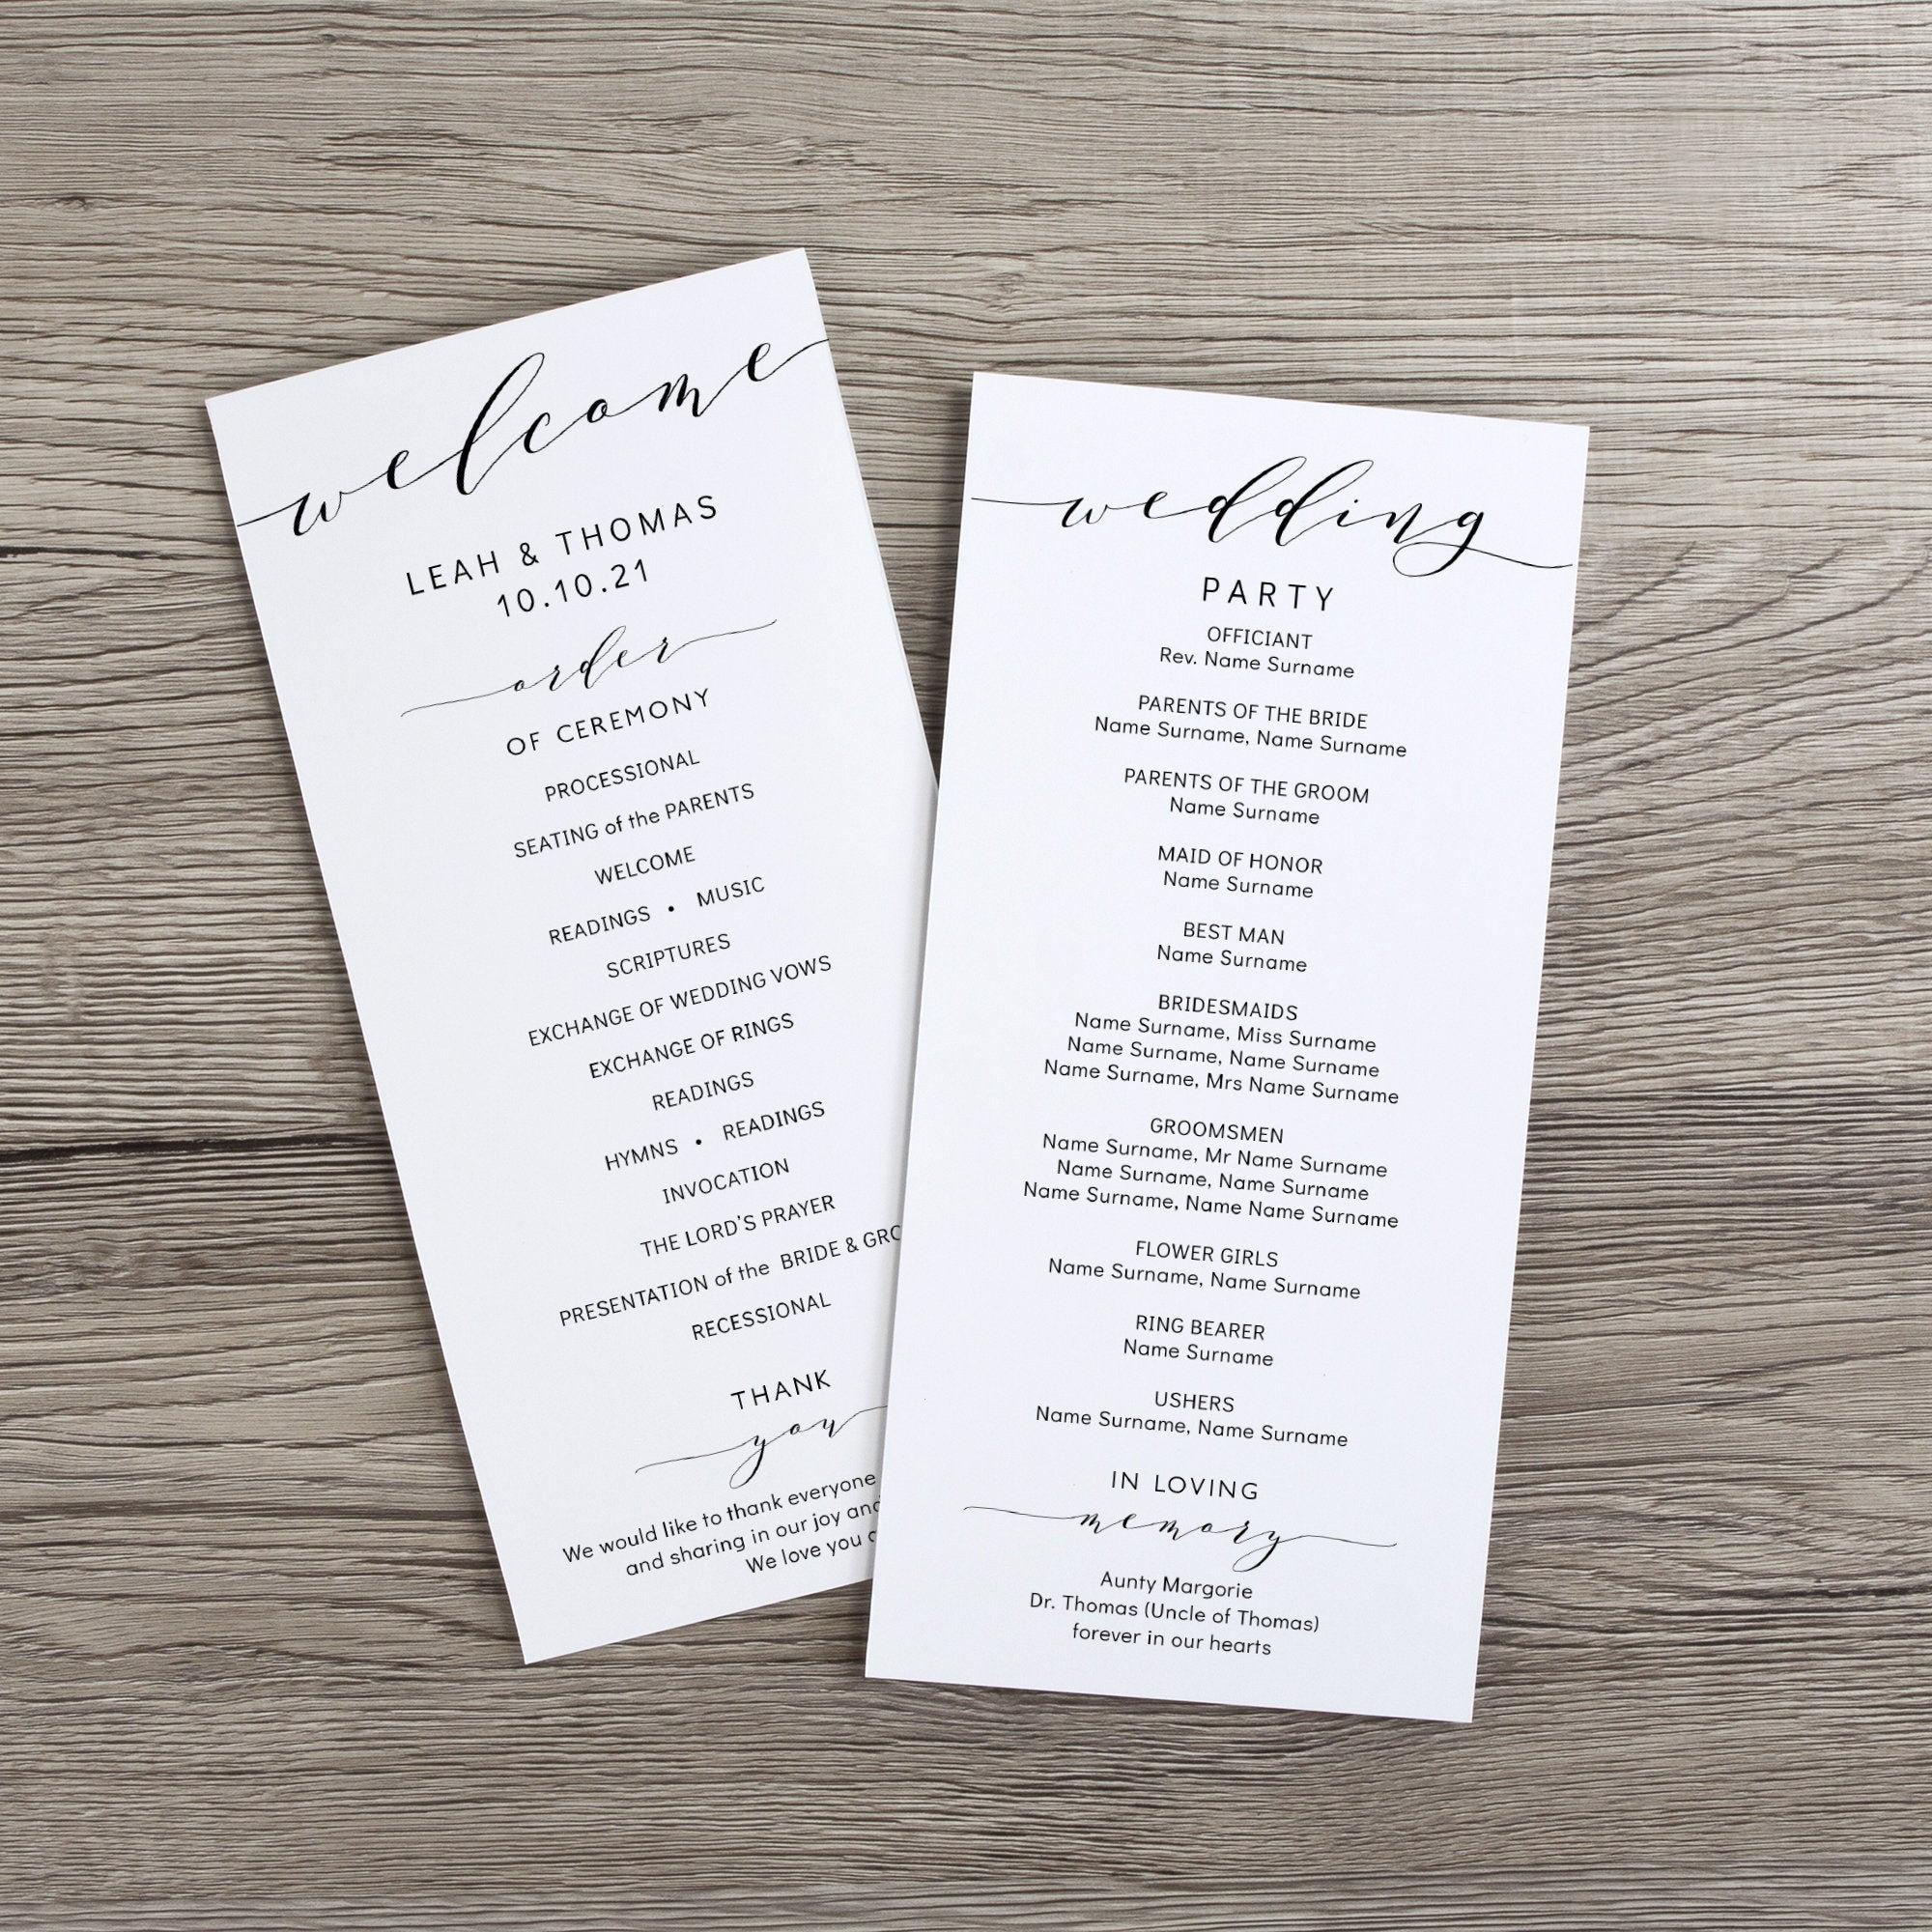 Wedding Ceremony Program Template Free from i.etsystatic.com